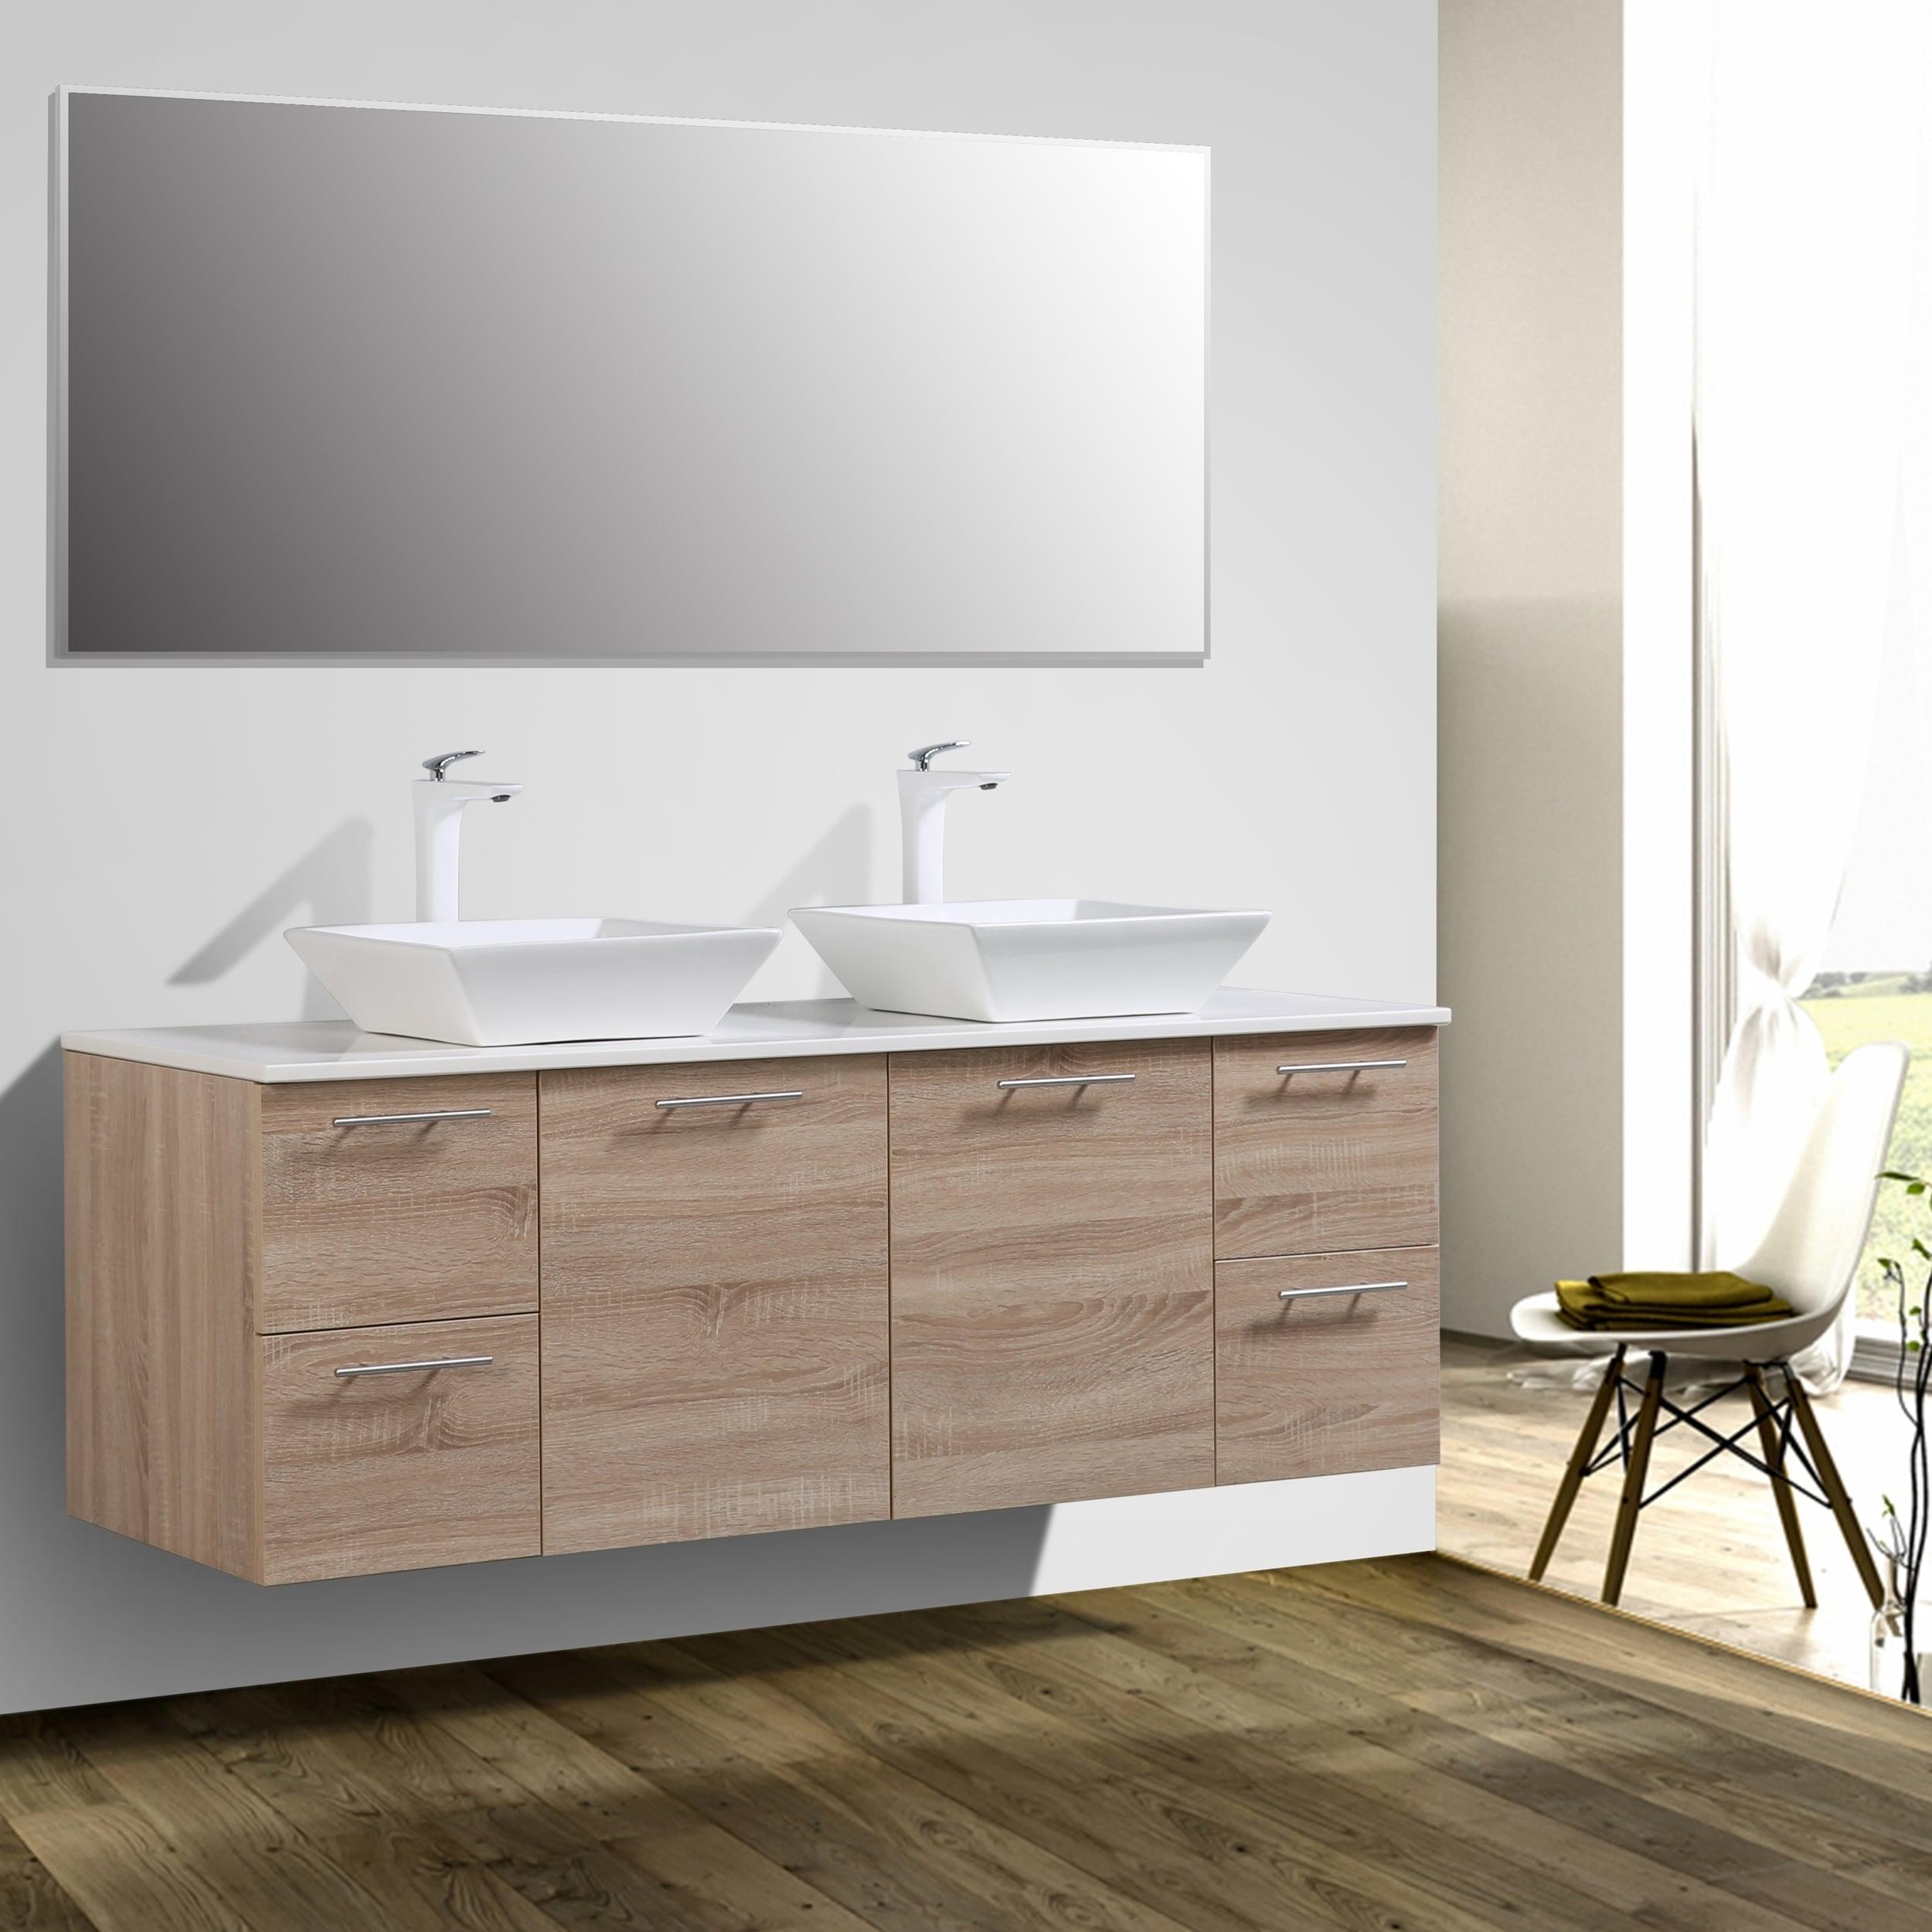 Eviva Luxury 60 Inch White Oak Bathroom Vanity Free Shipping Today 20174466